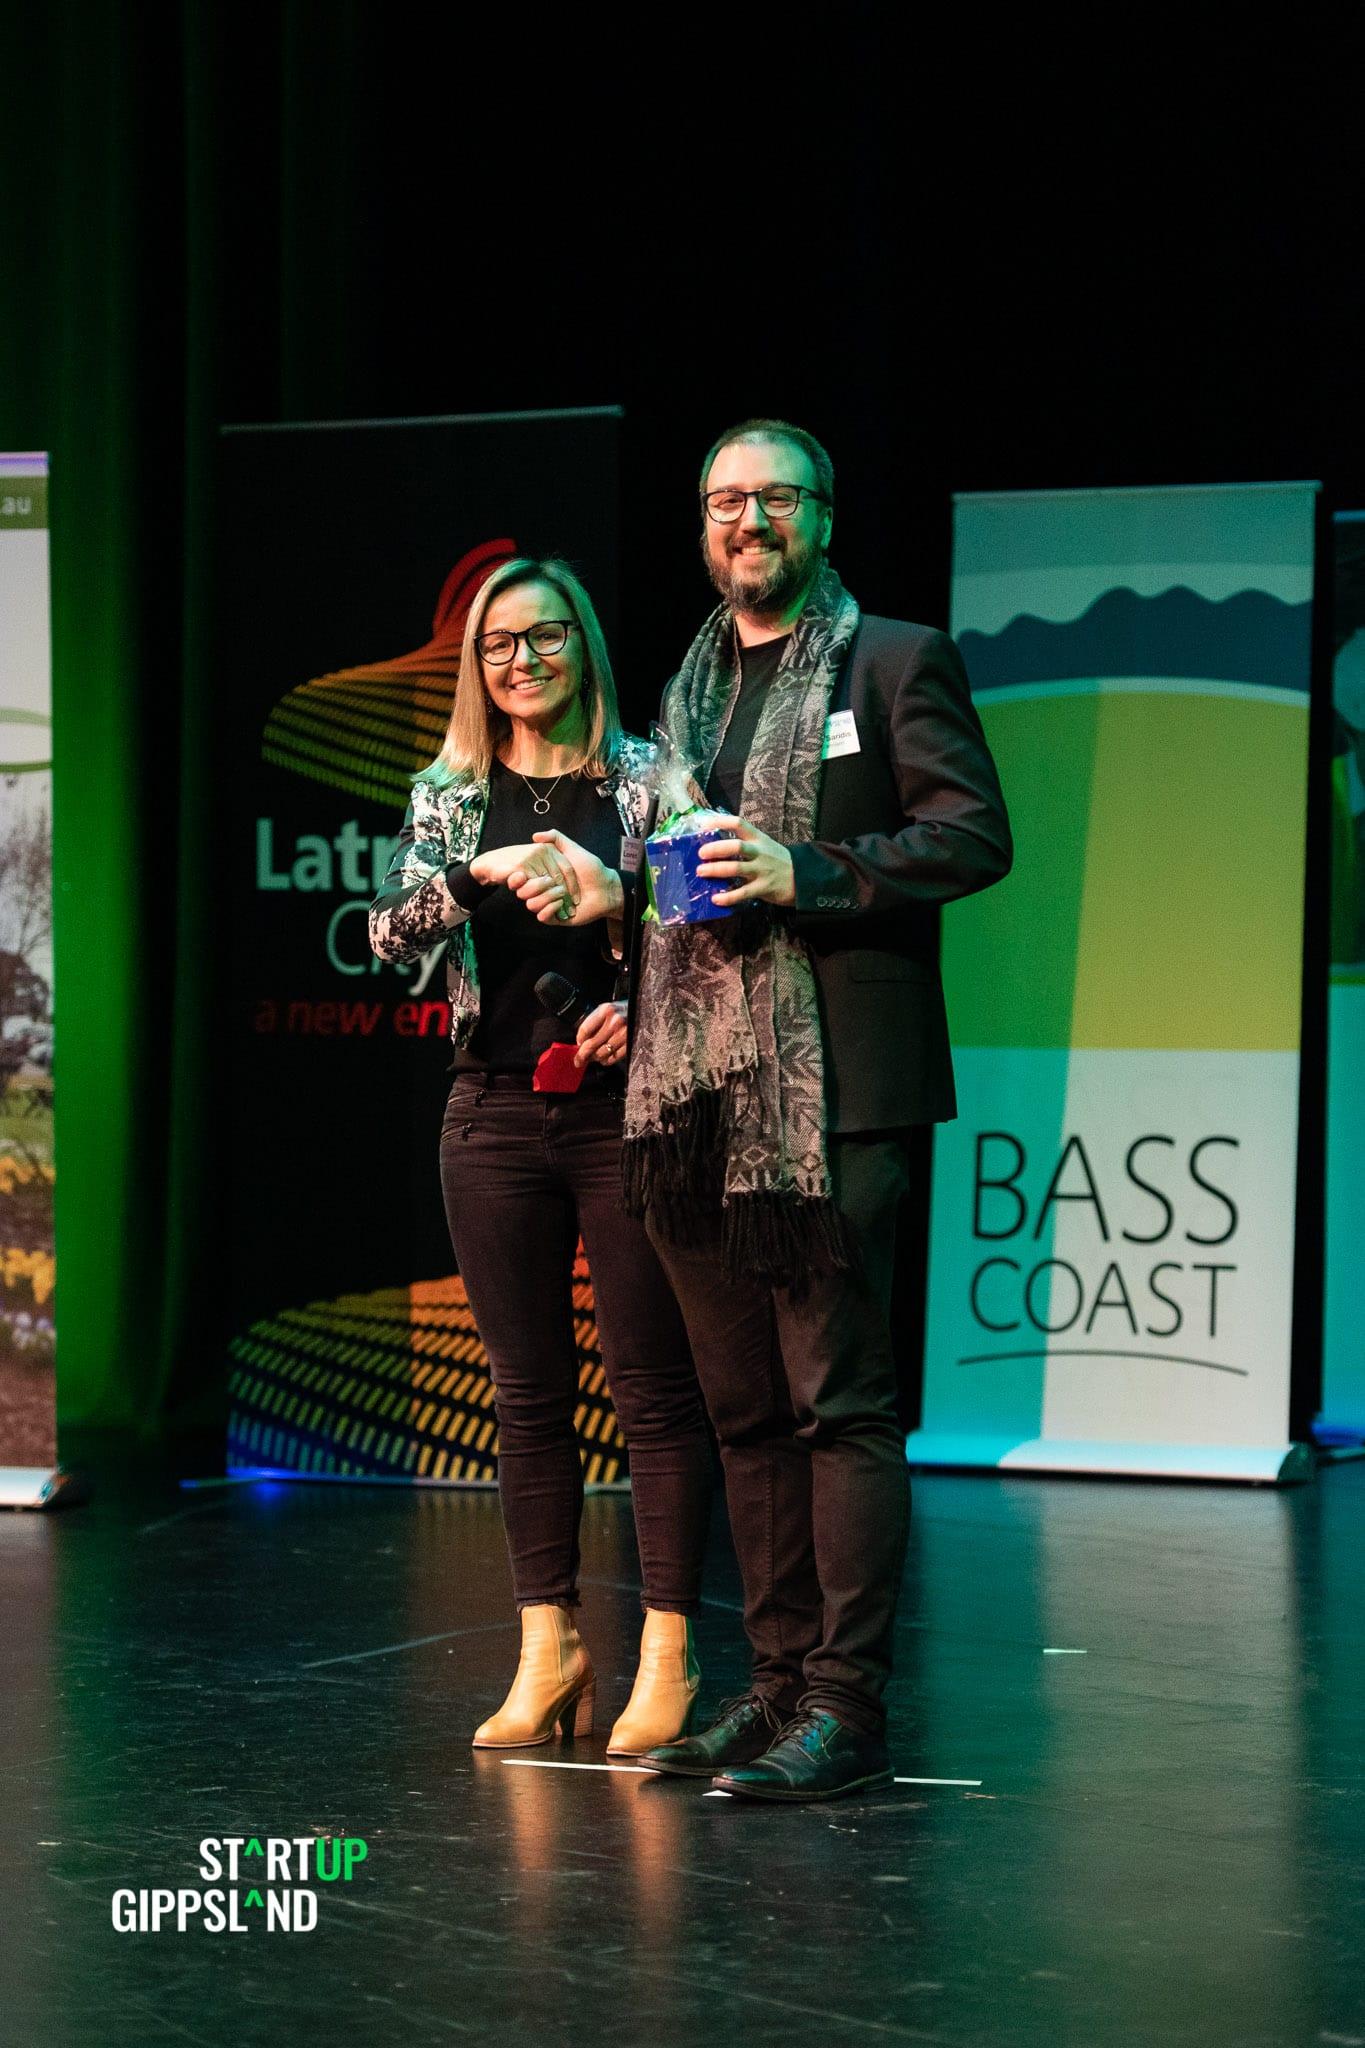 Angelo Saridis Urban Farmland Marketplace Startup Gippsland Winner People's choice award